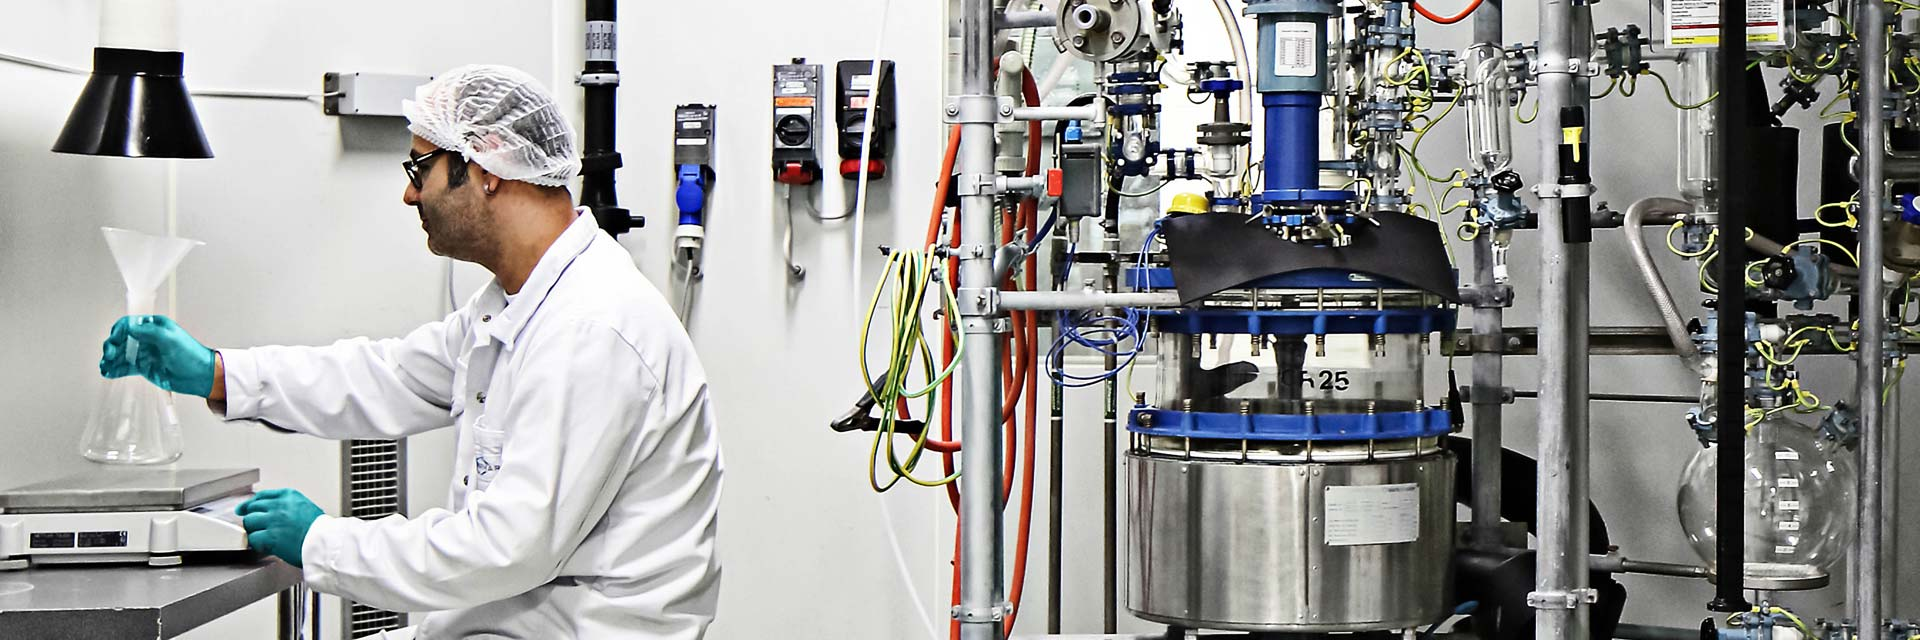 CordenPharma Lipids & Carbohydrates APIs technician processing APIs into a flask near 25 L reactor in a synthetic phospholipid kilo lab suite